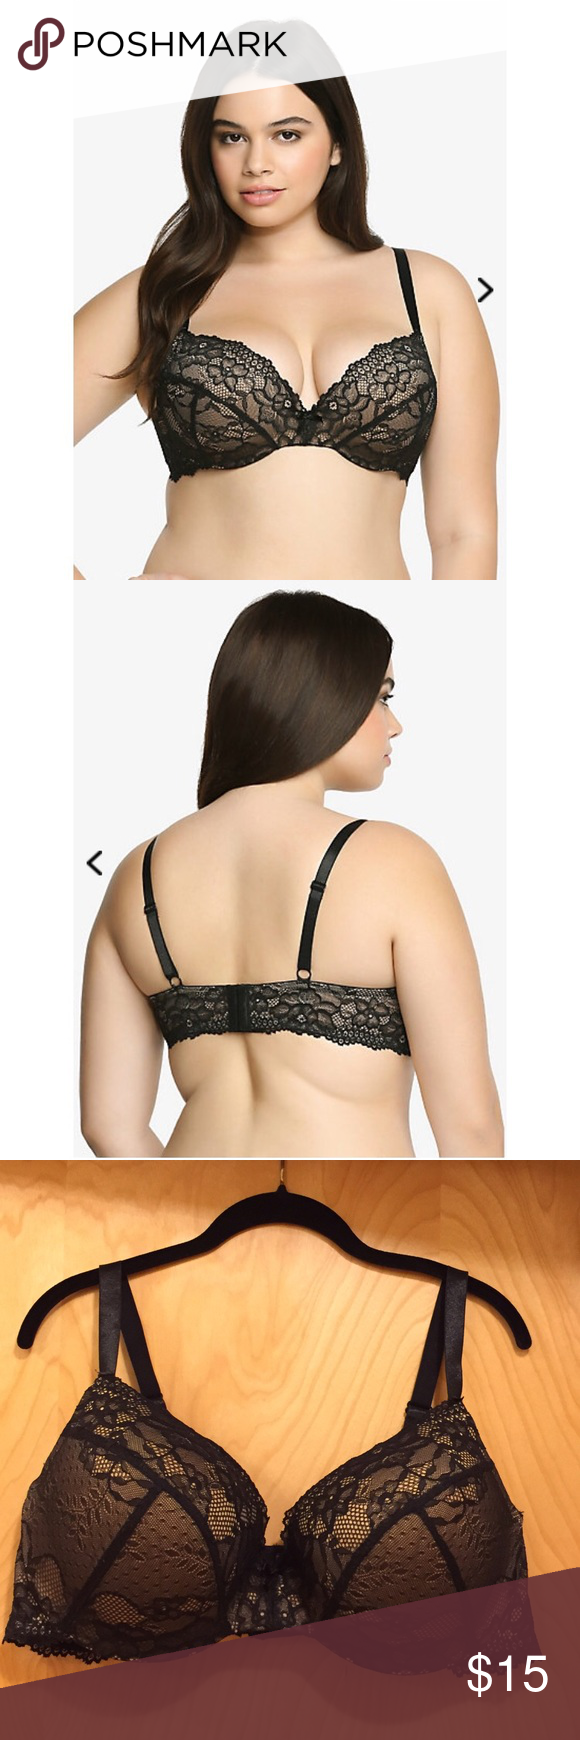 2199fb41af435 EUC Torrid Lace Push-Up Bra in Black 44DD Padded underwire push up bra in